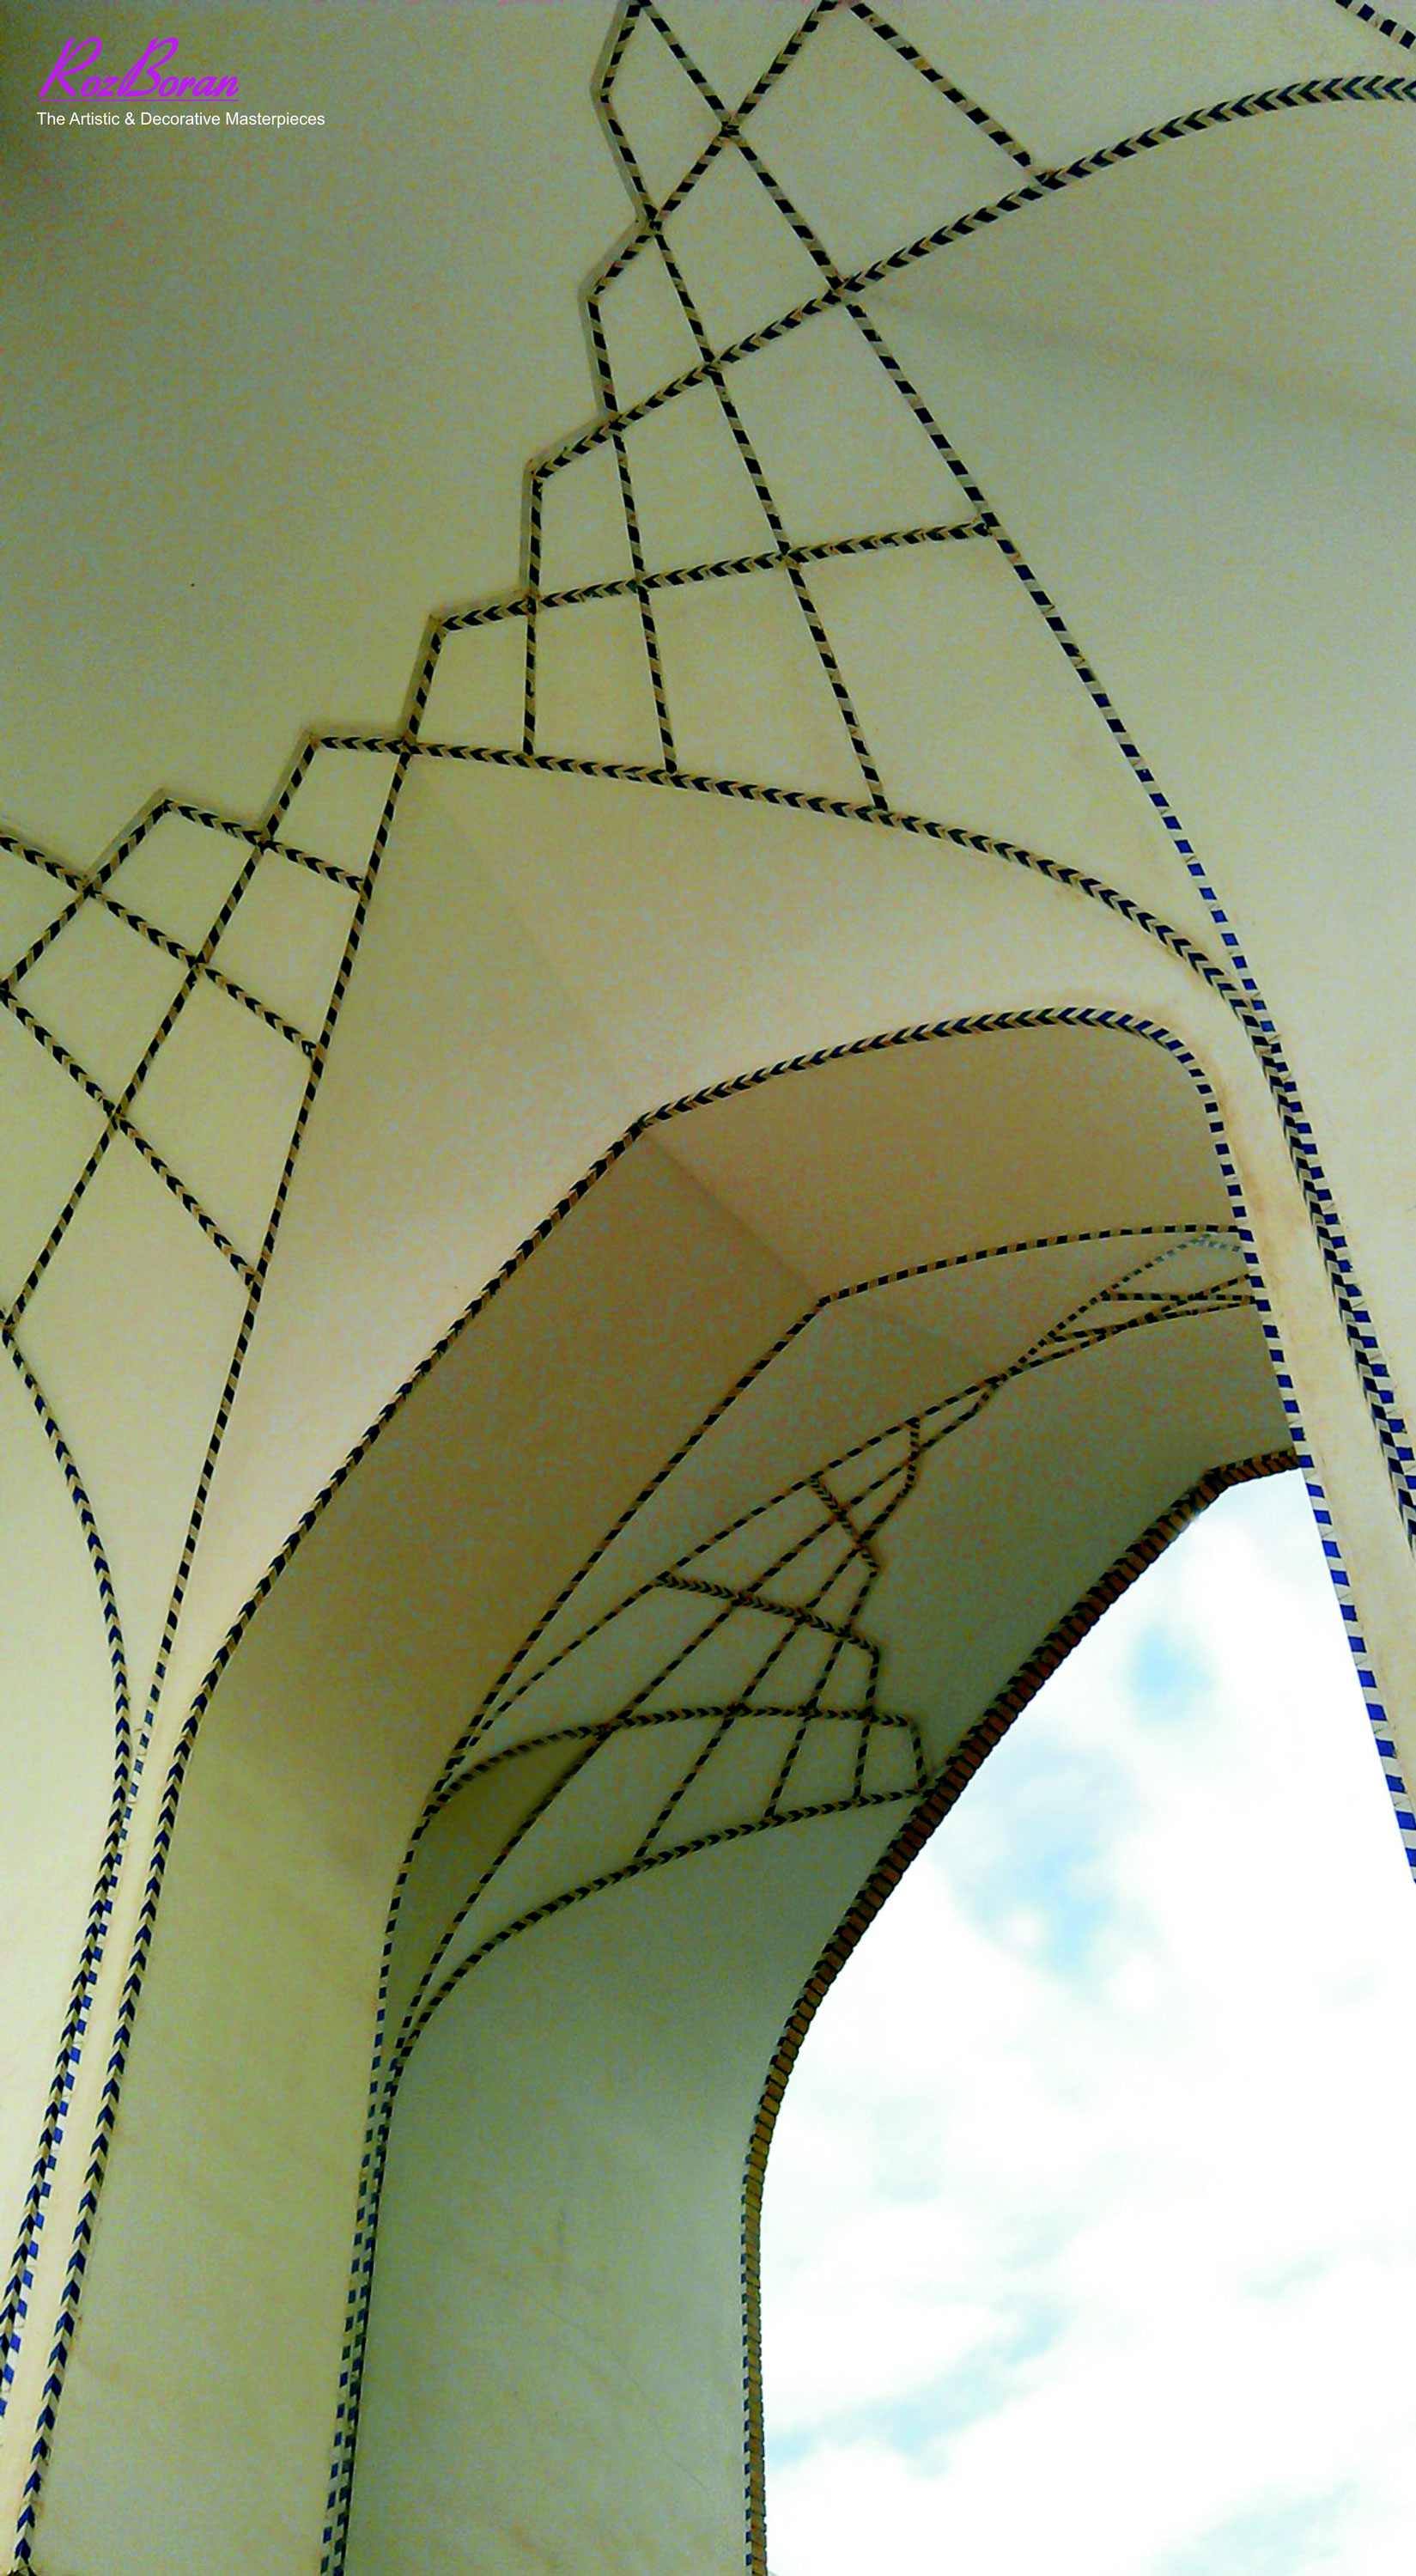 معماری اسلامی و هنر کاربندی